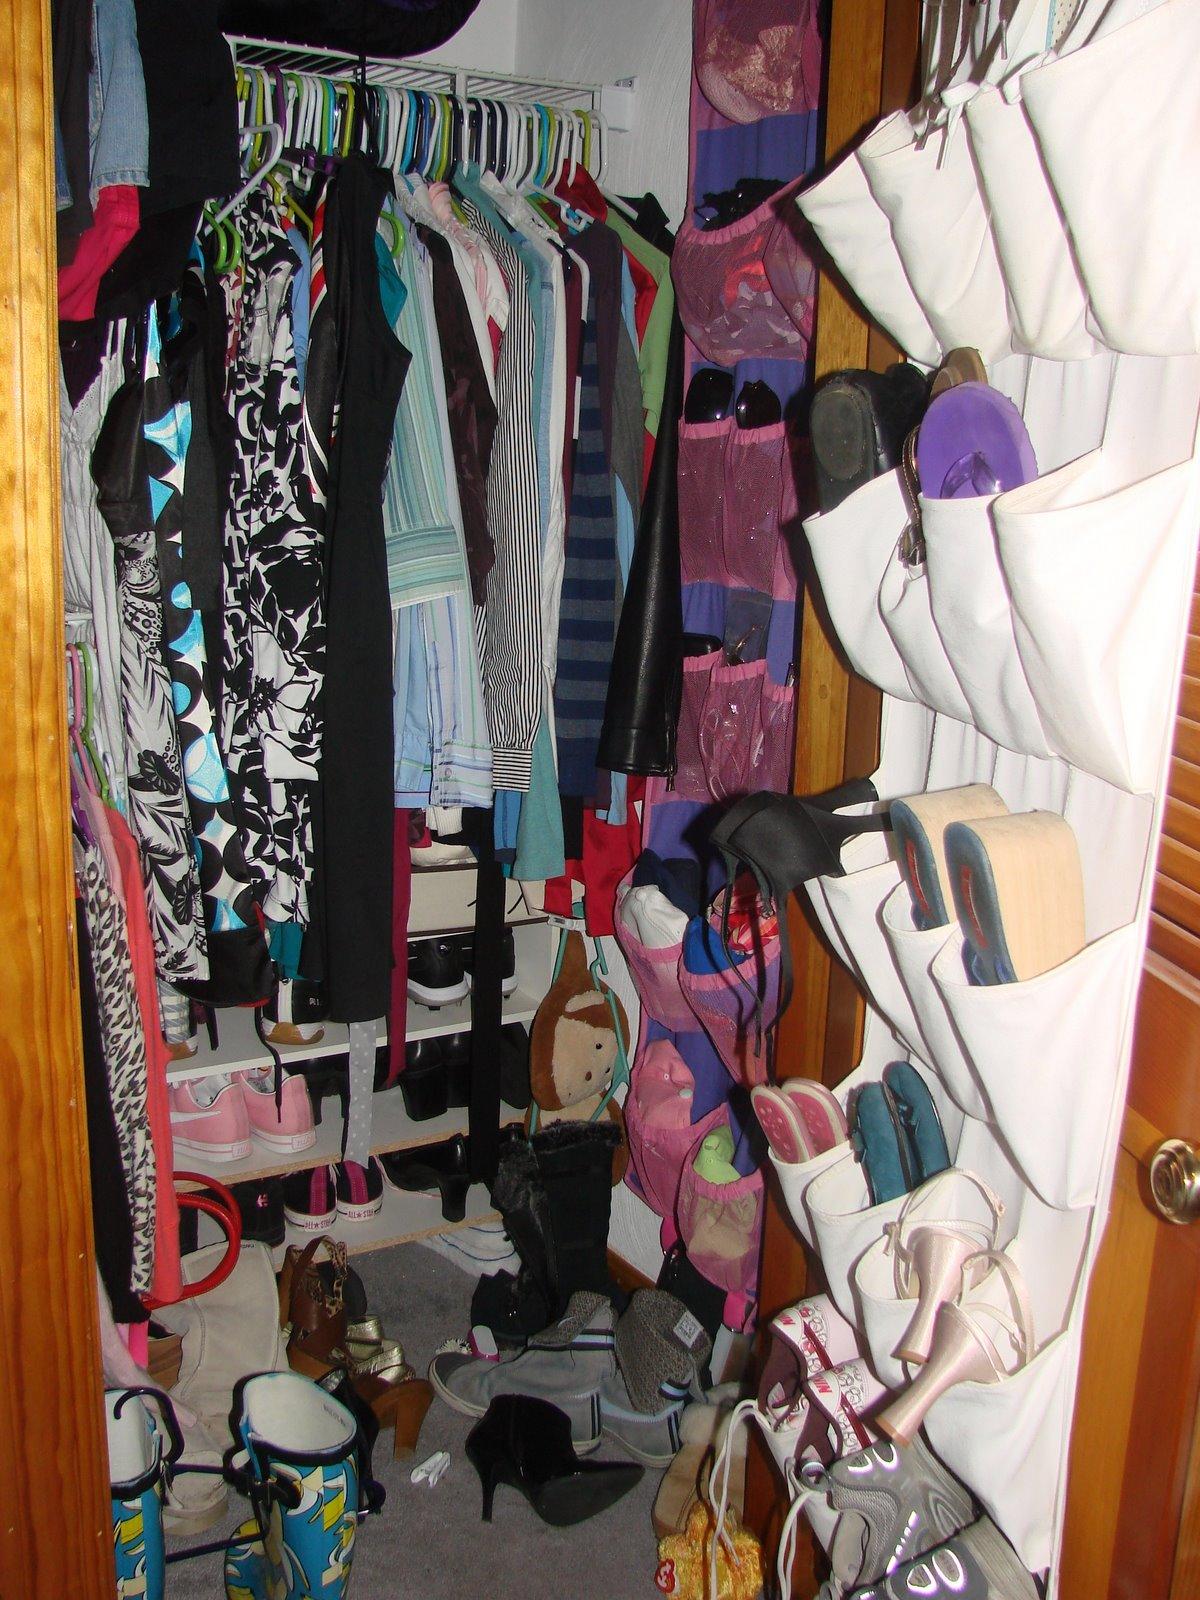 [dirty+closet.JPG]